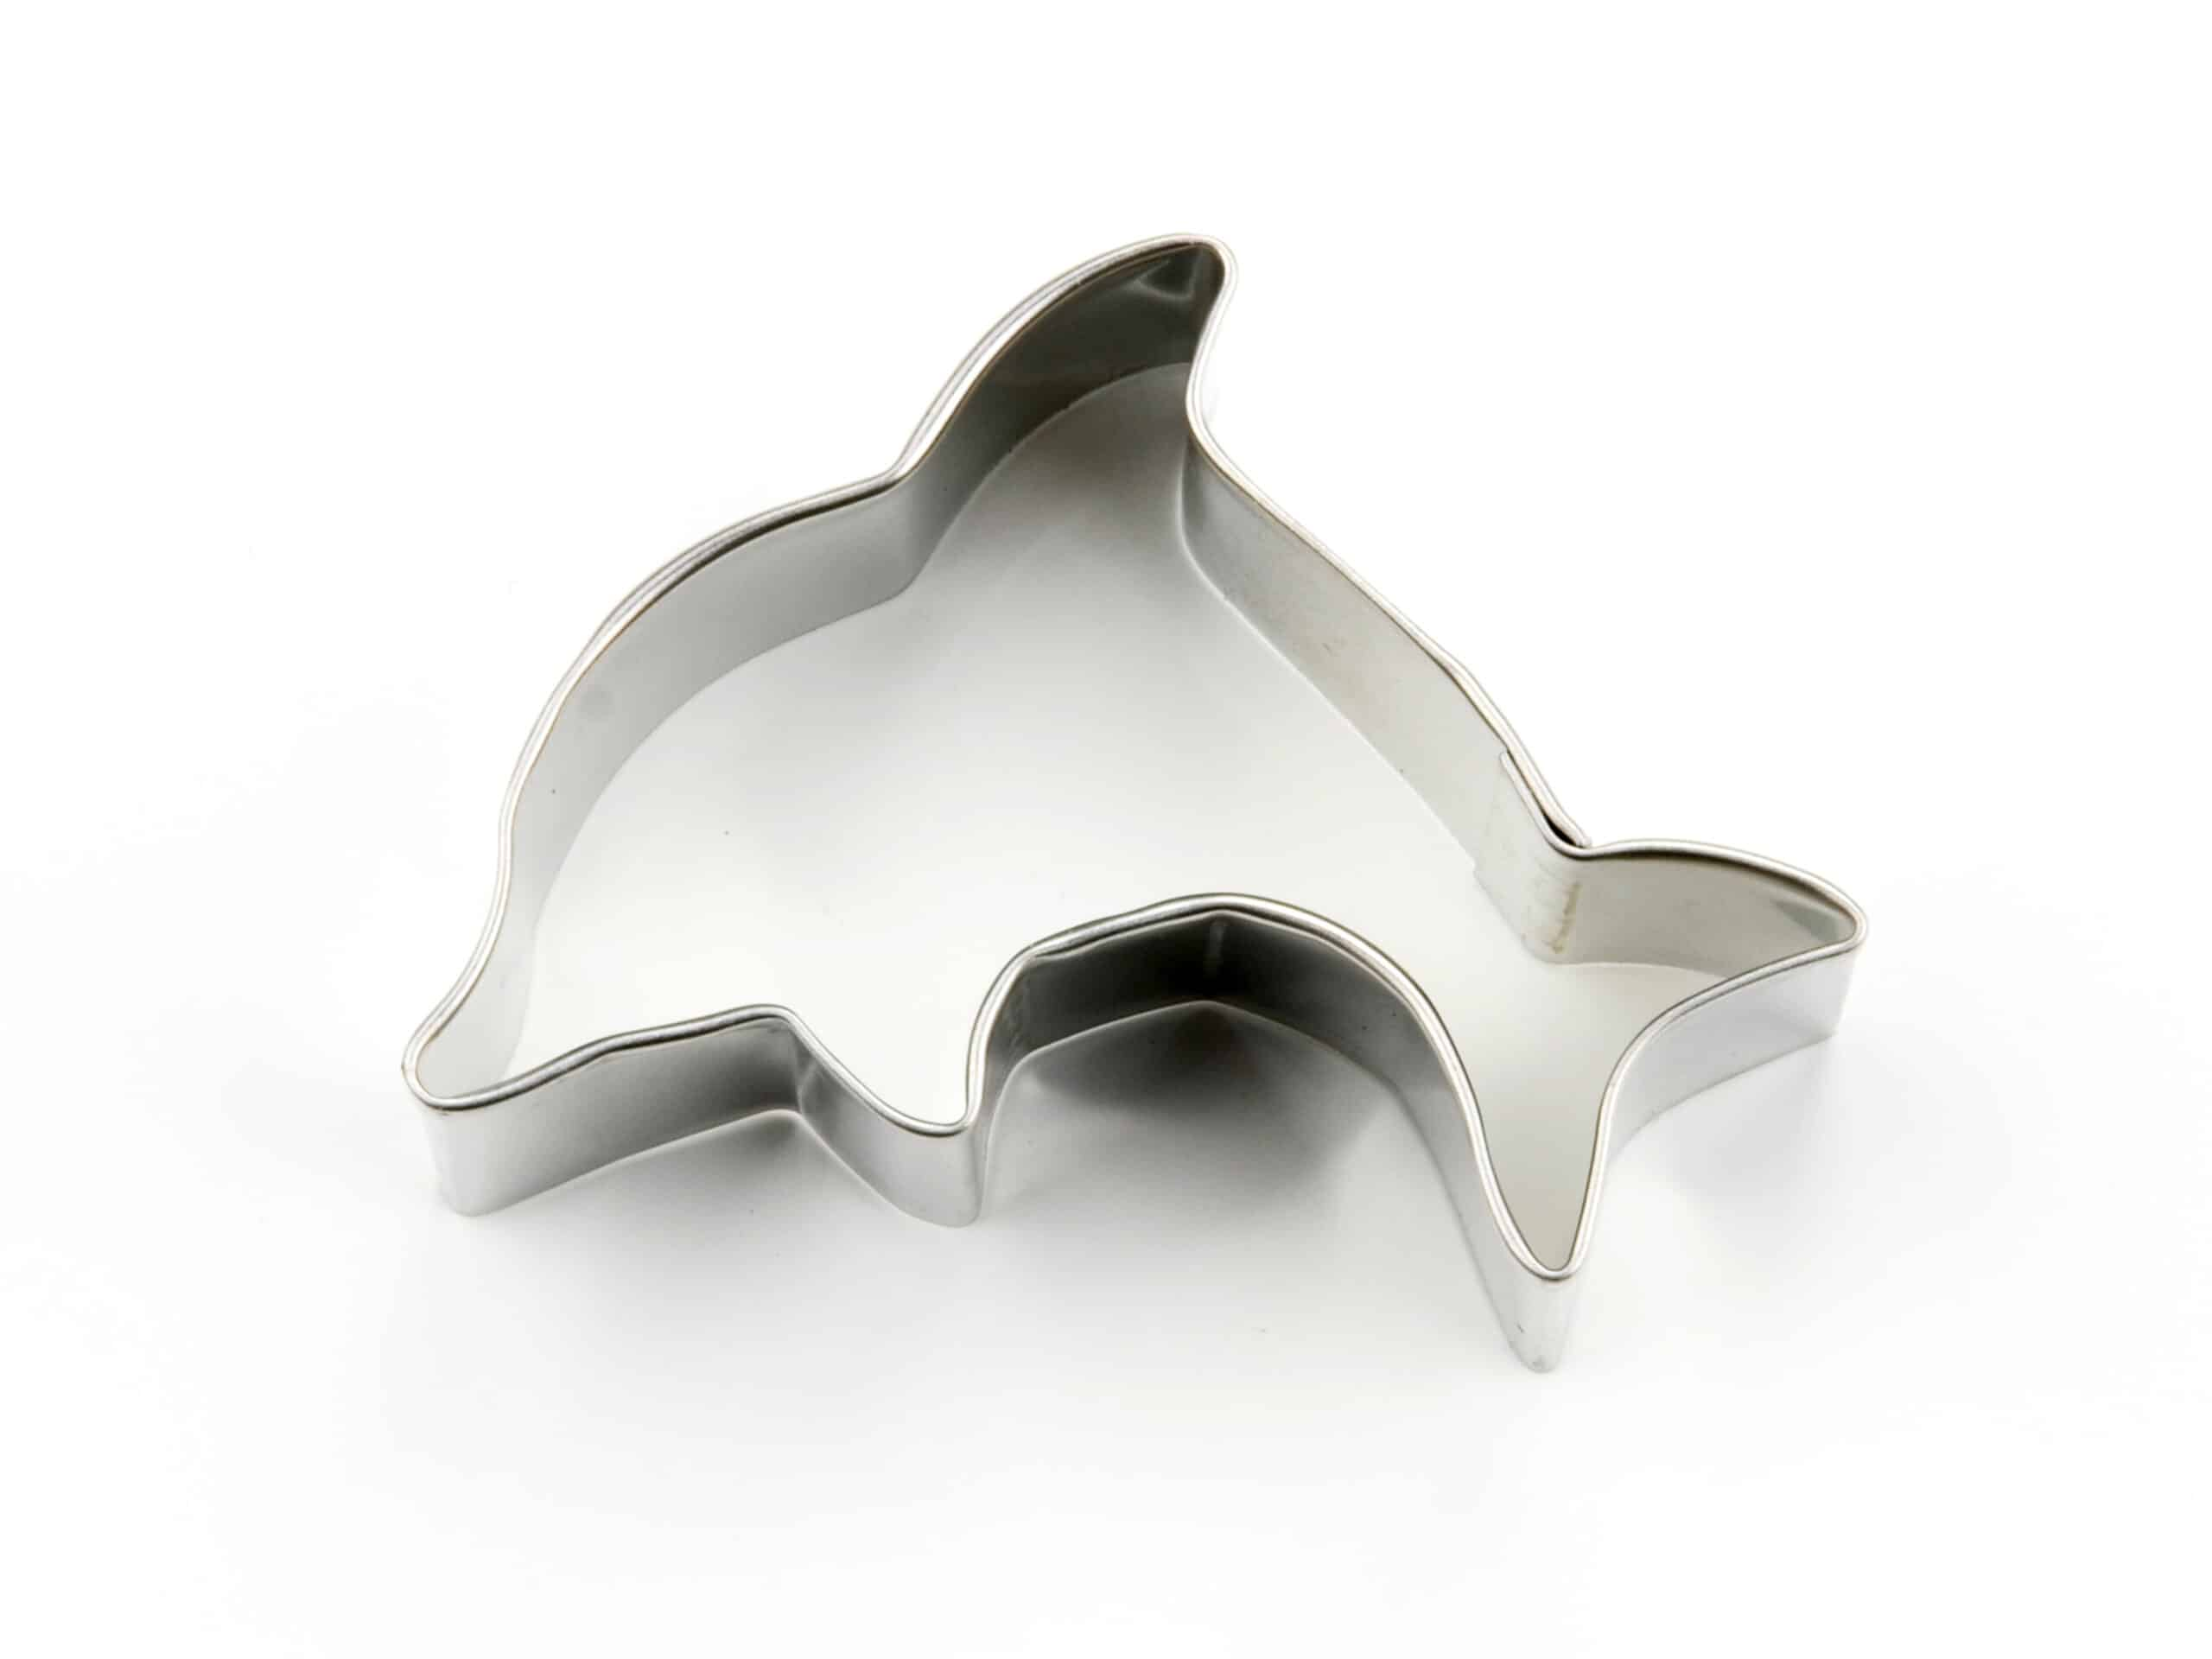 Ausstecher Delphin 6,5 cm